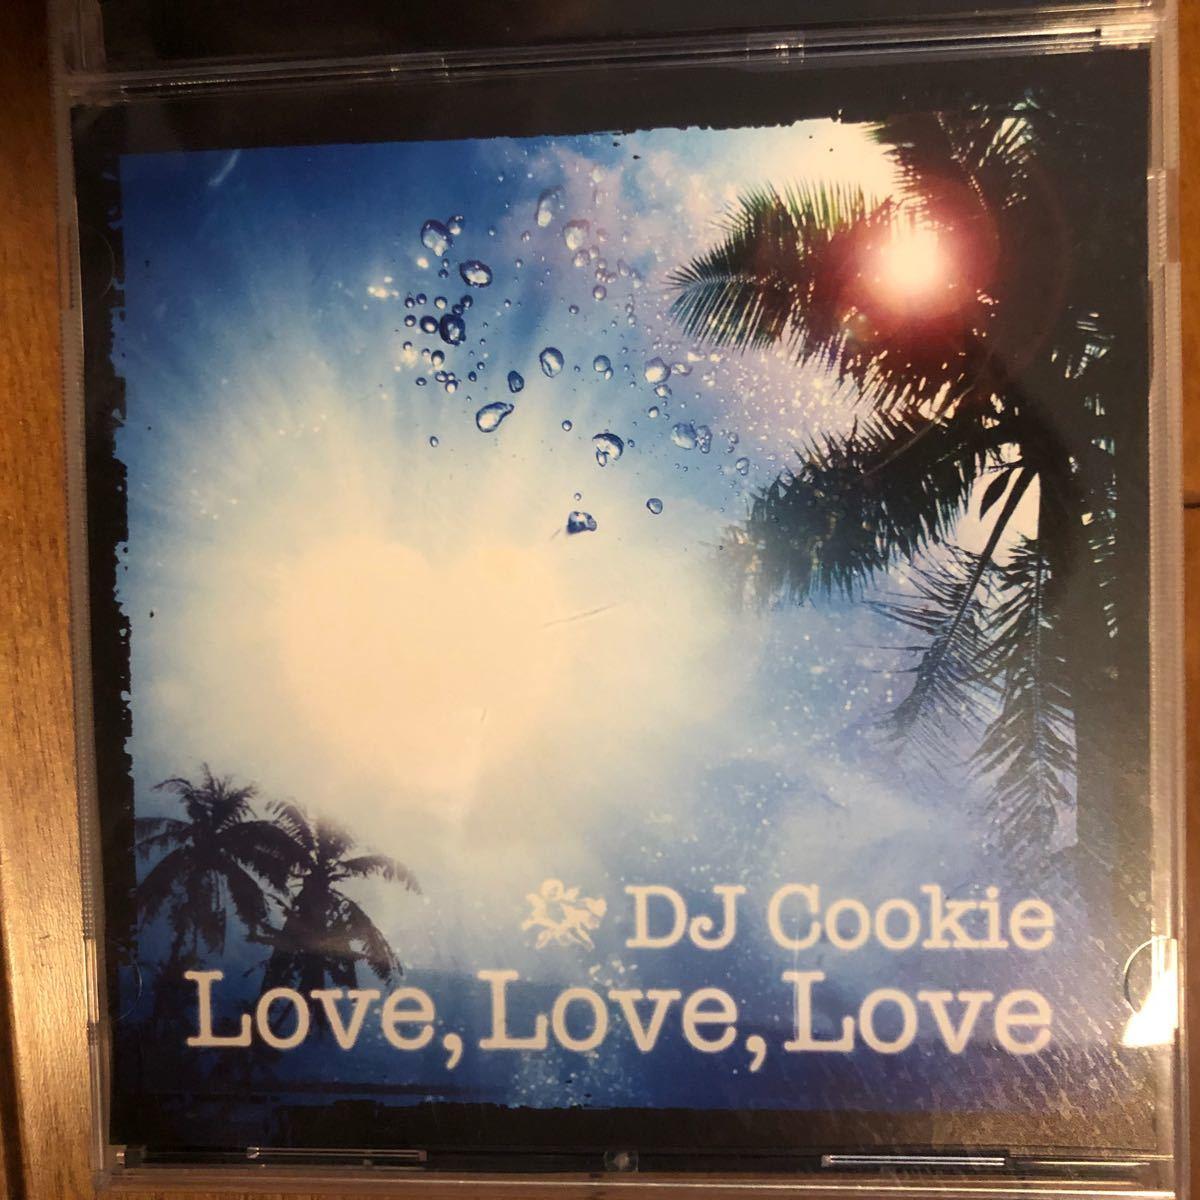 DJ Cookie LOVE,LOVE,LOVE Mix CD